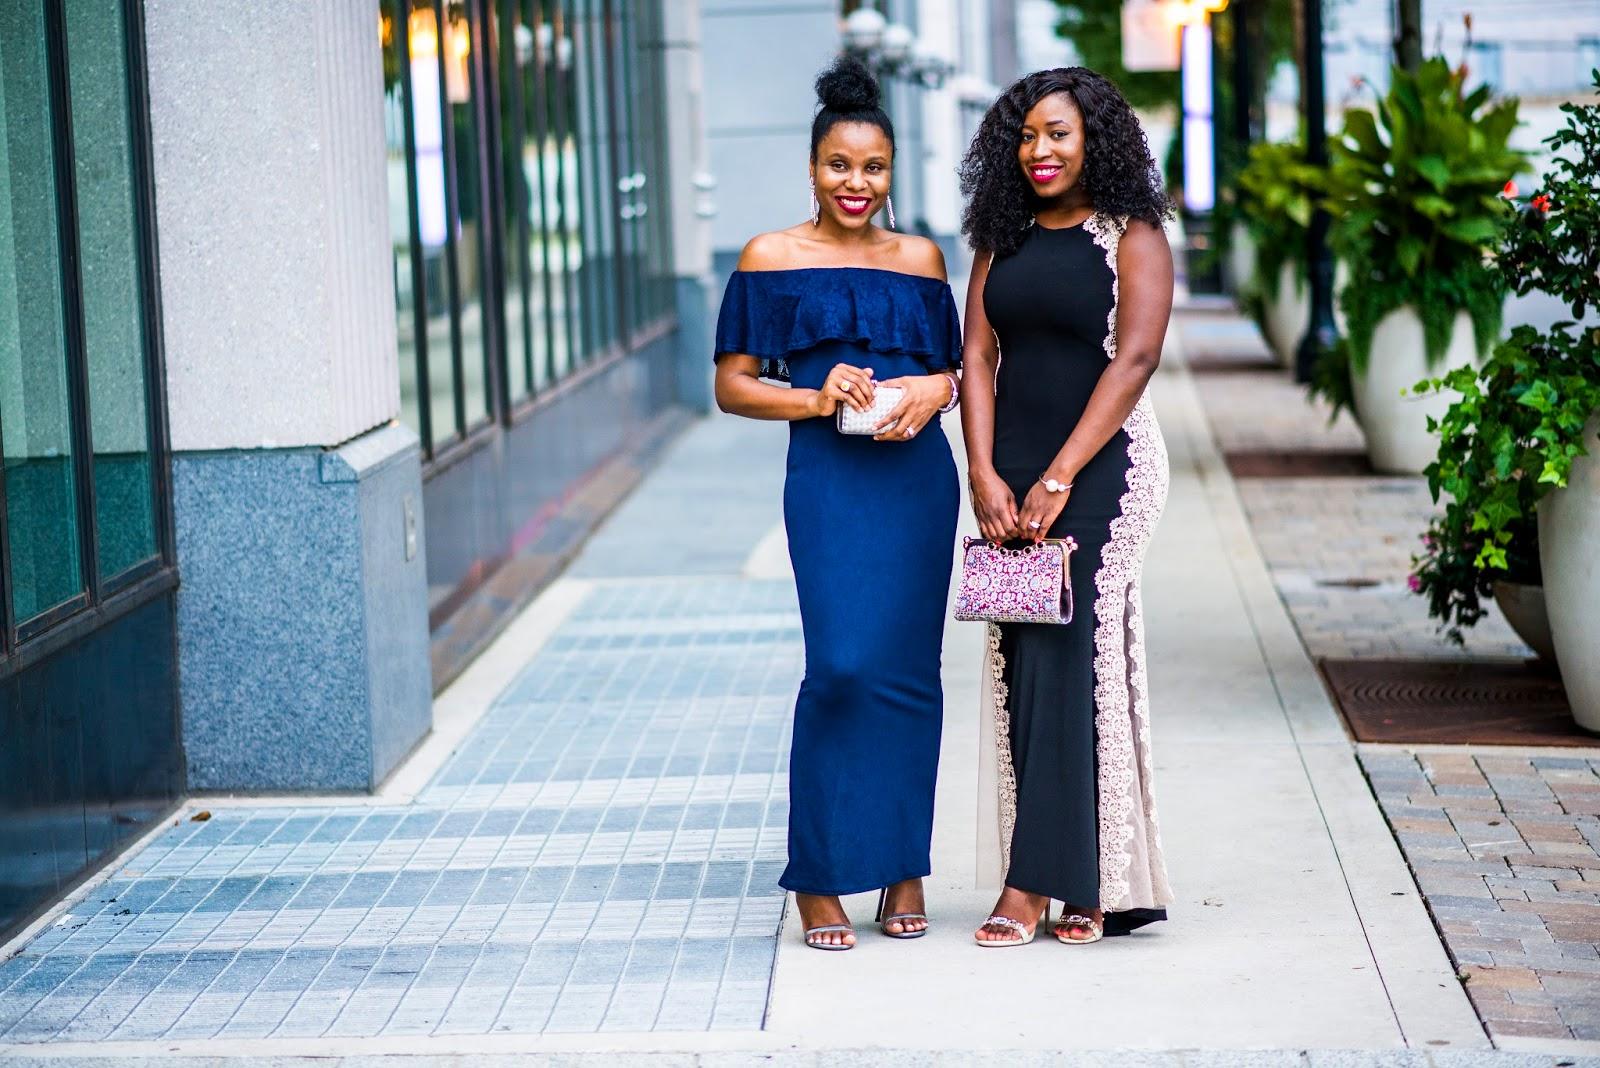 Fashion Collaboration: Evening wear